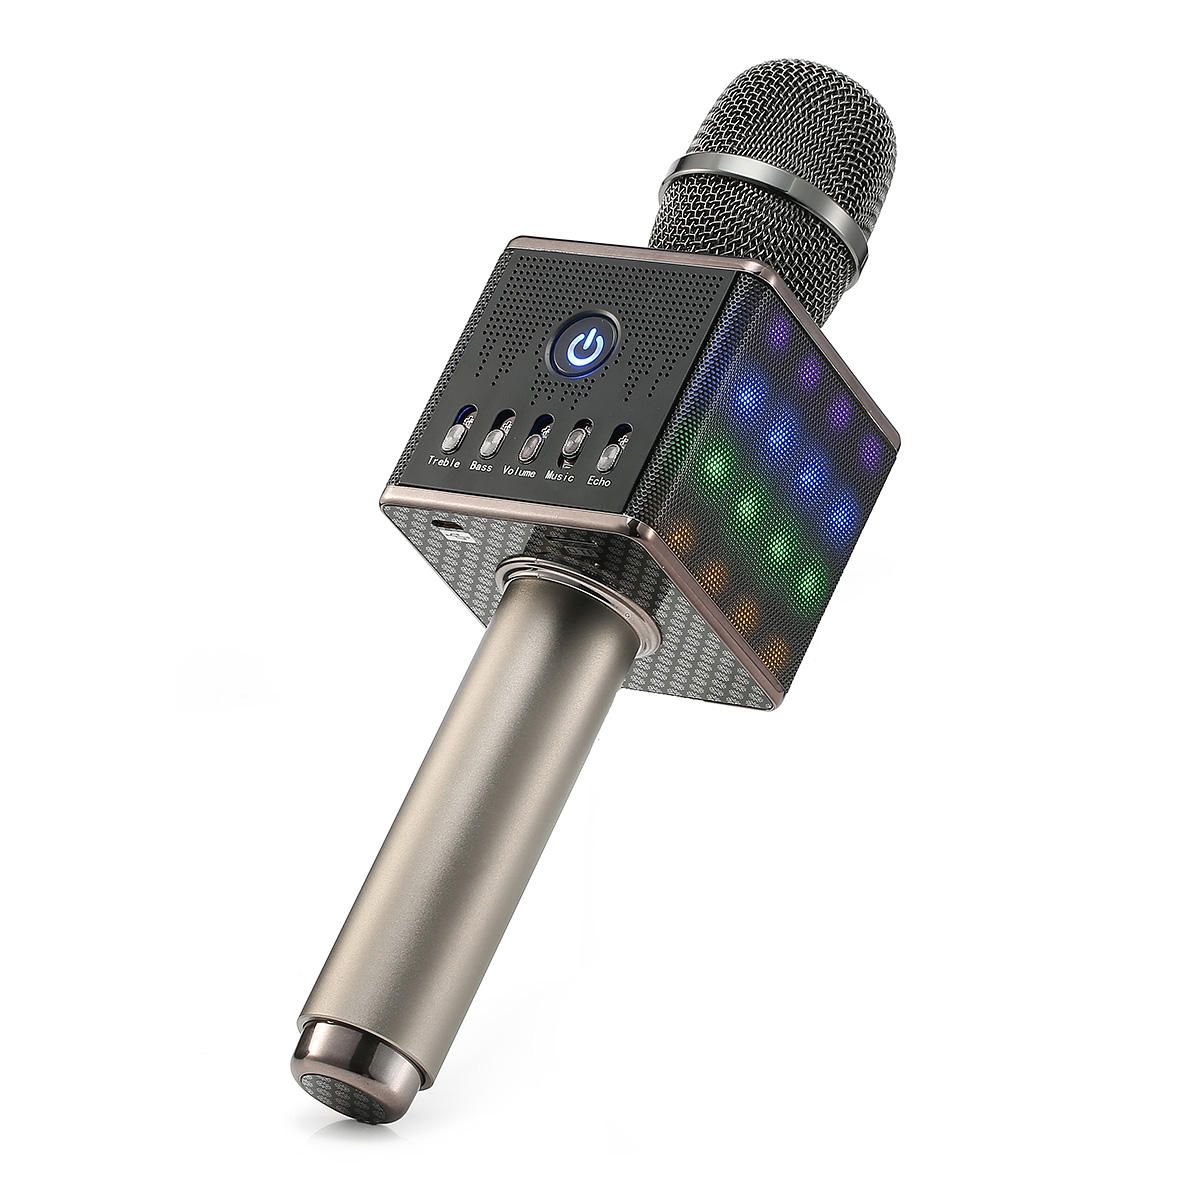 [US$53.58] H8 LED Wireless Microphone Mic Built in Bluetooth Speaker Mini Handheld Cell Phone Karaoke Player #wireless #microphone #built #bluetooth #speaker #mini #handheld #cell #phone #karaoke #player #karaokeplayer